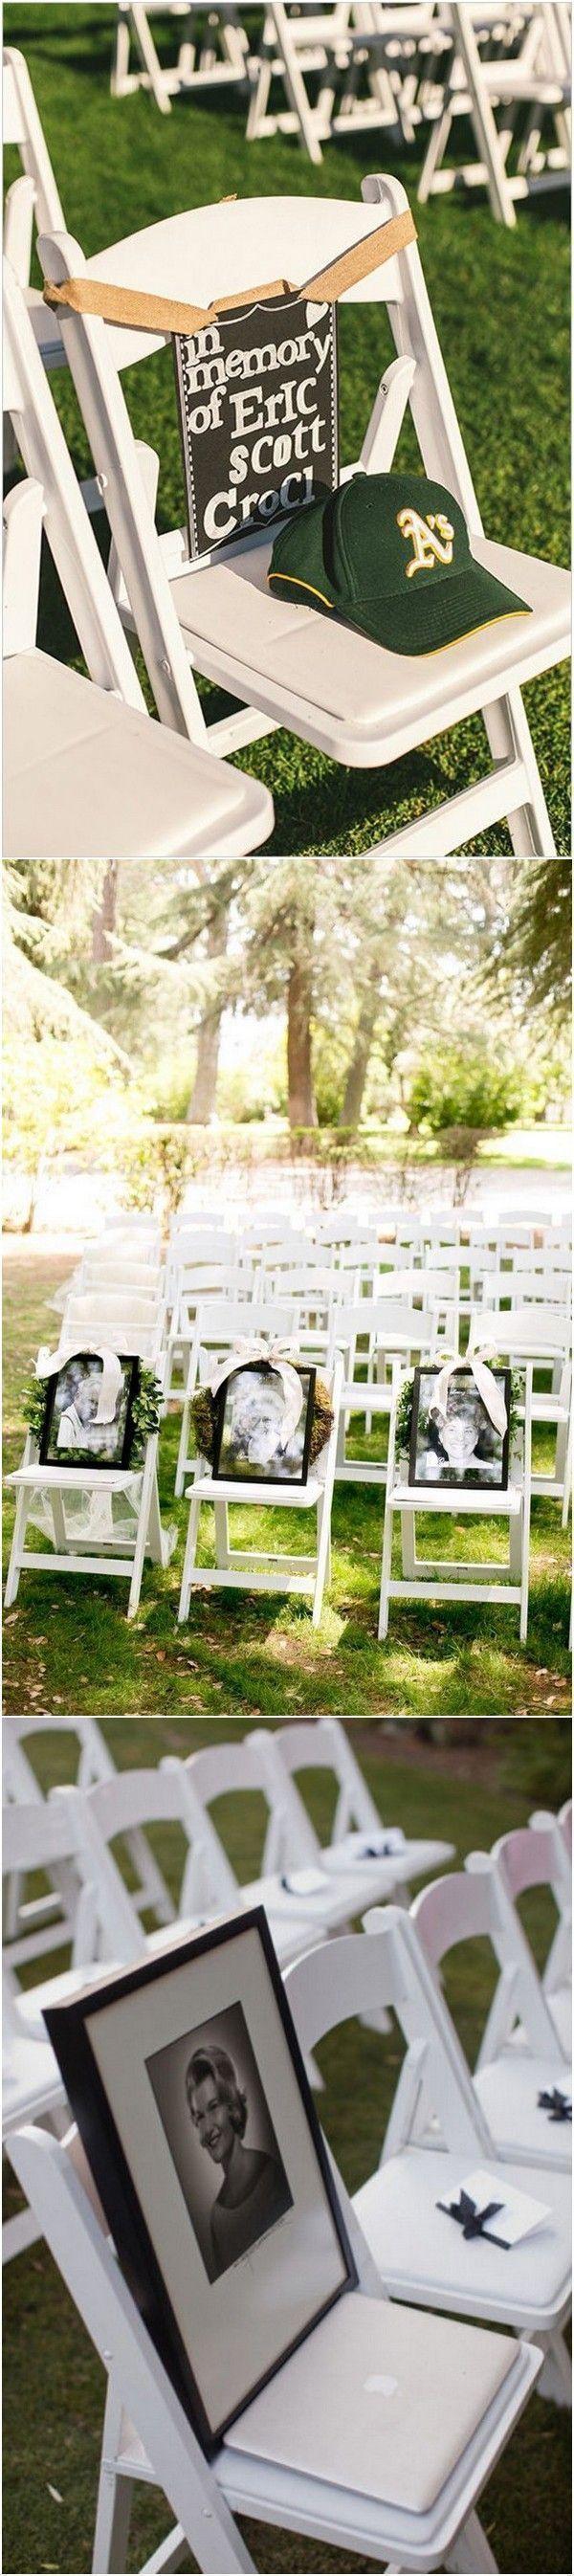 best wedding images on pinterest wedding bouquets wedding